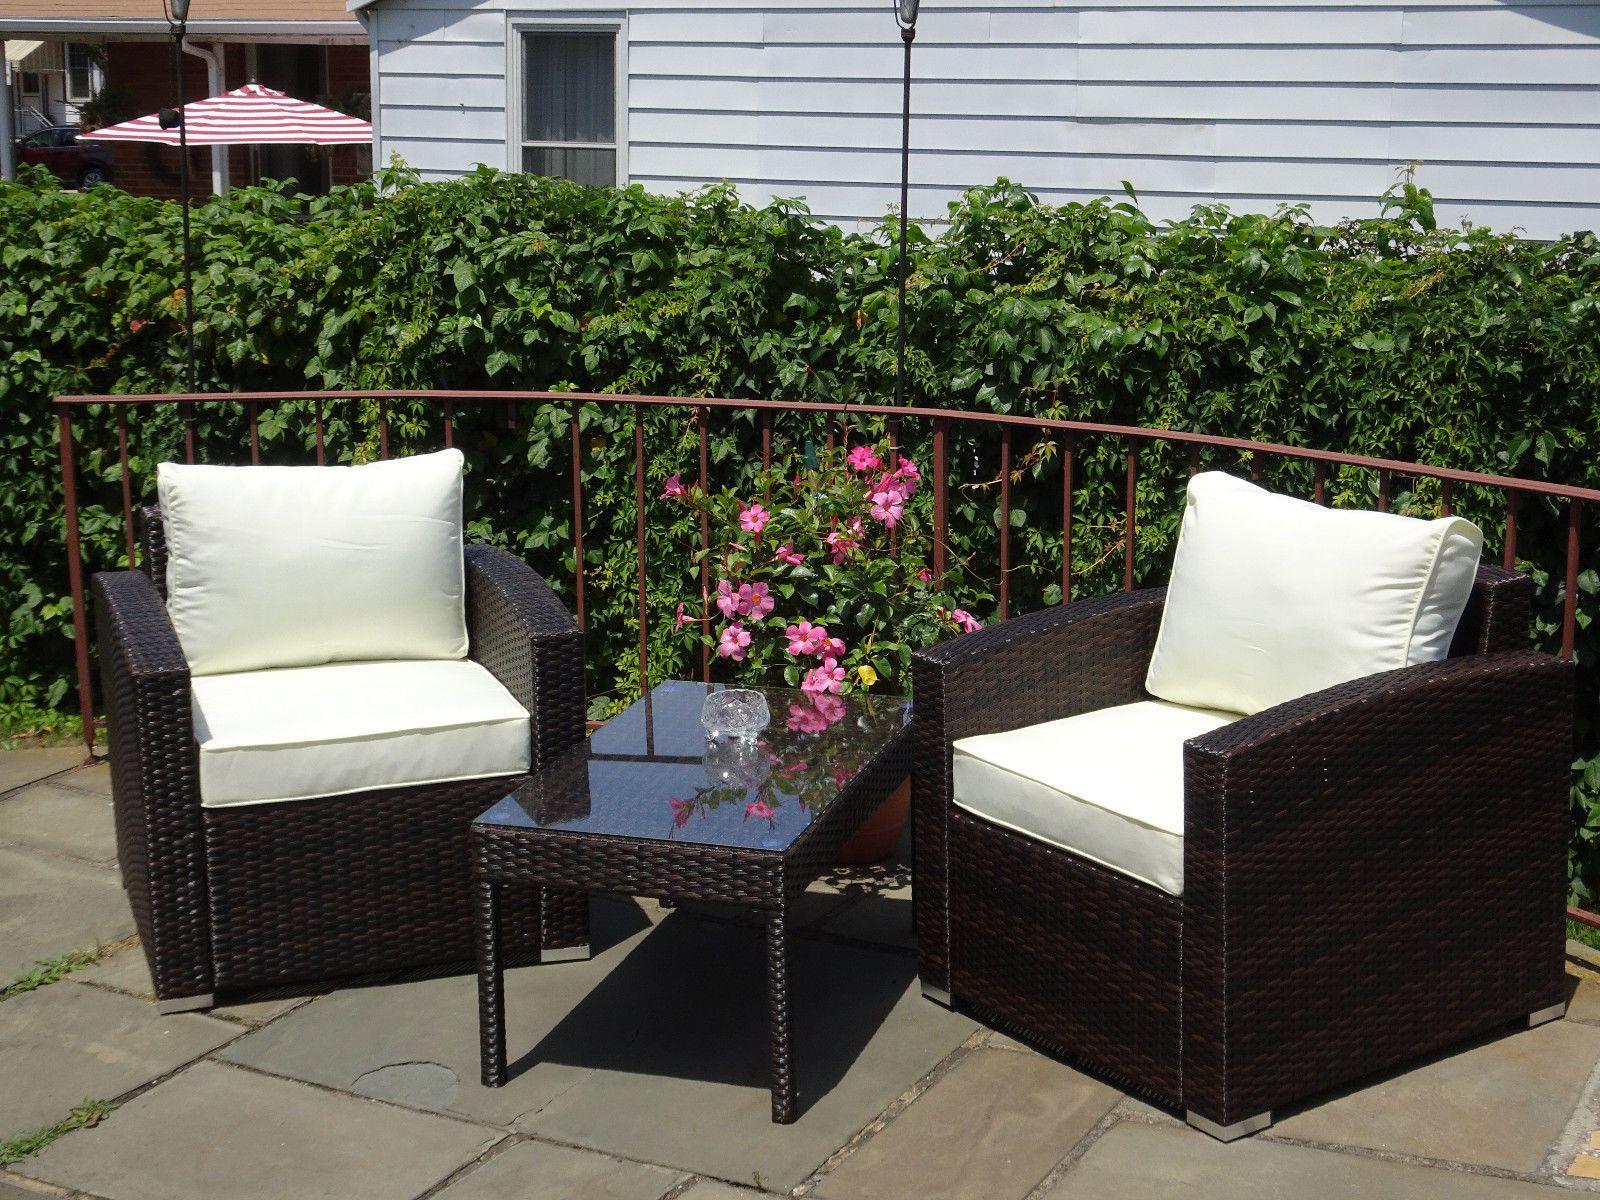 Furnitures Patio Resin Outdoor 3 Pc Wicker Lounge Set Dark Brown